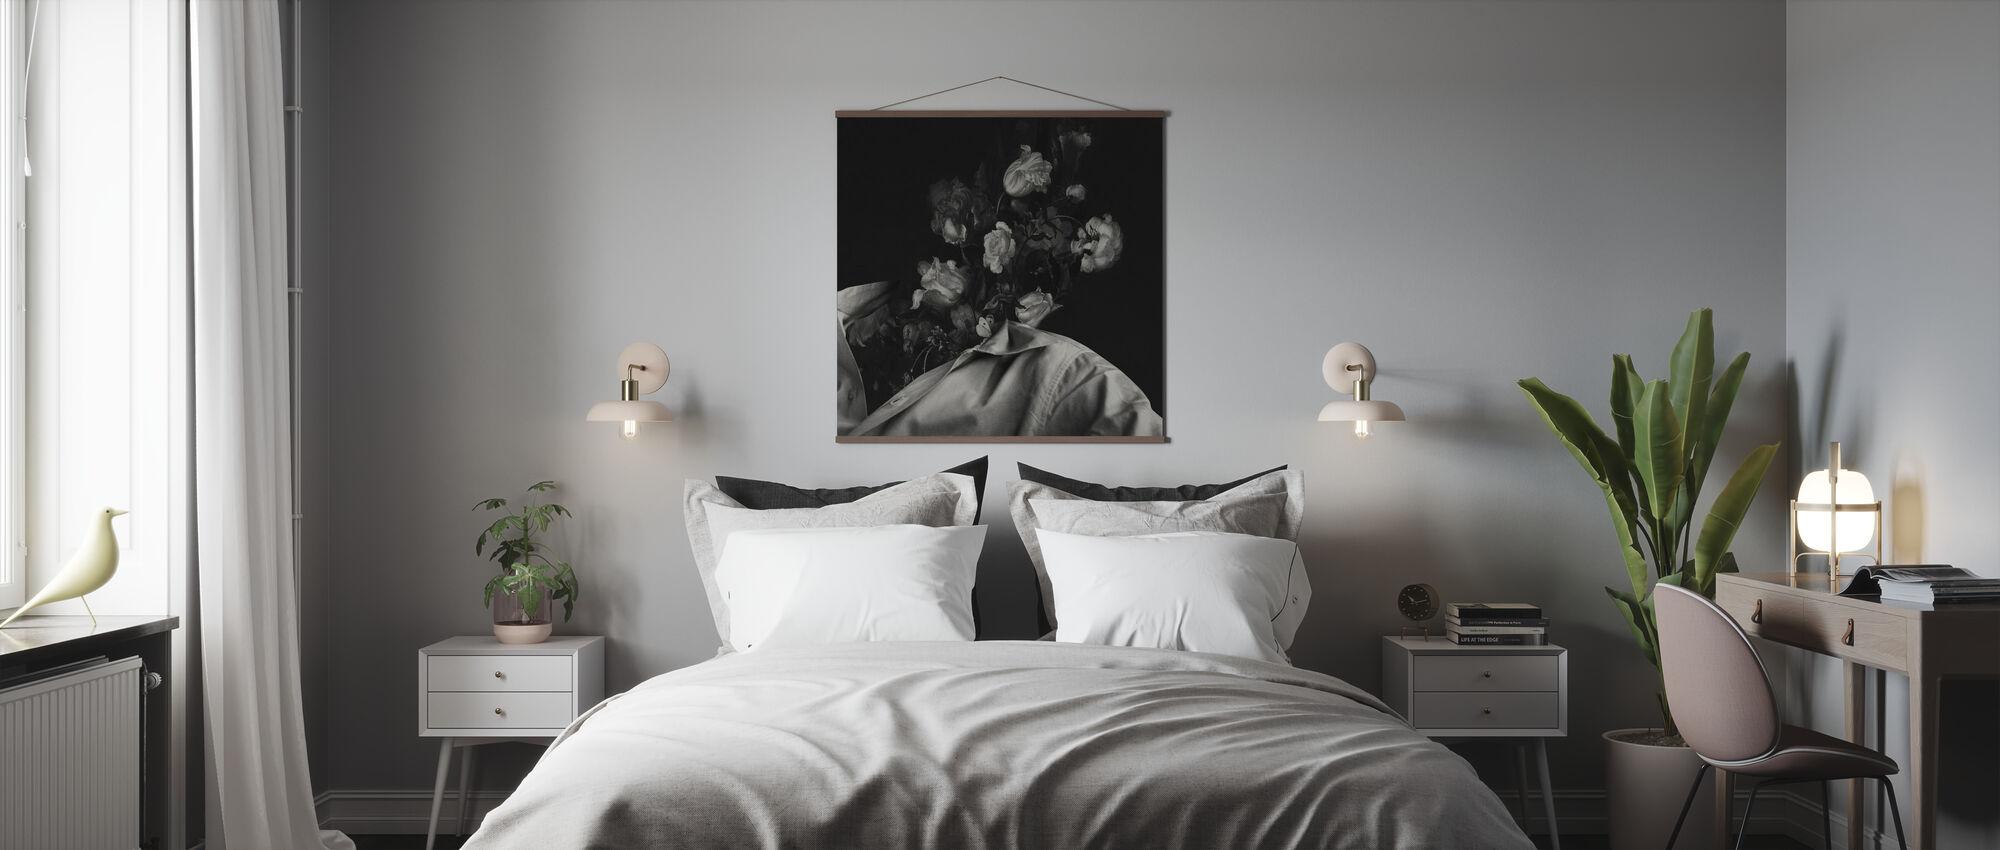 In Blüte - Poster - Schlafzimmer